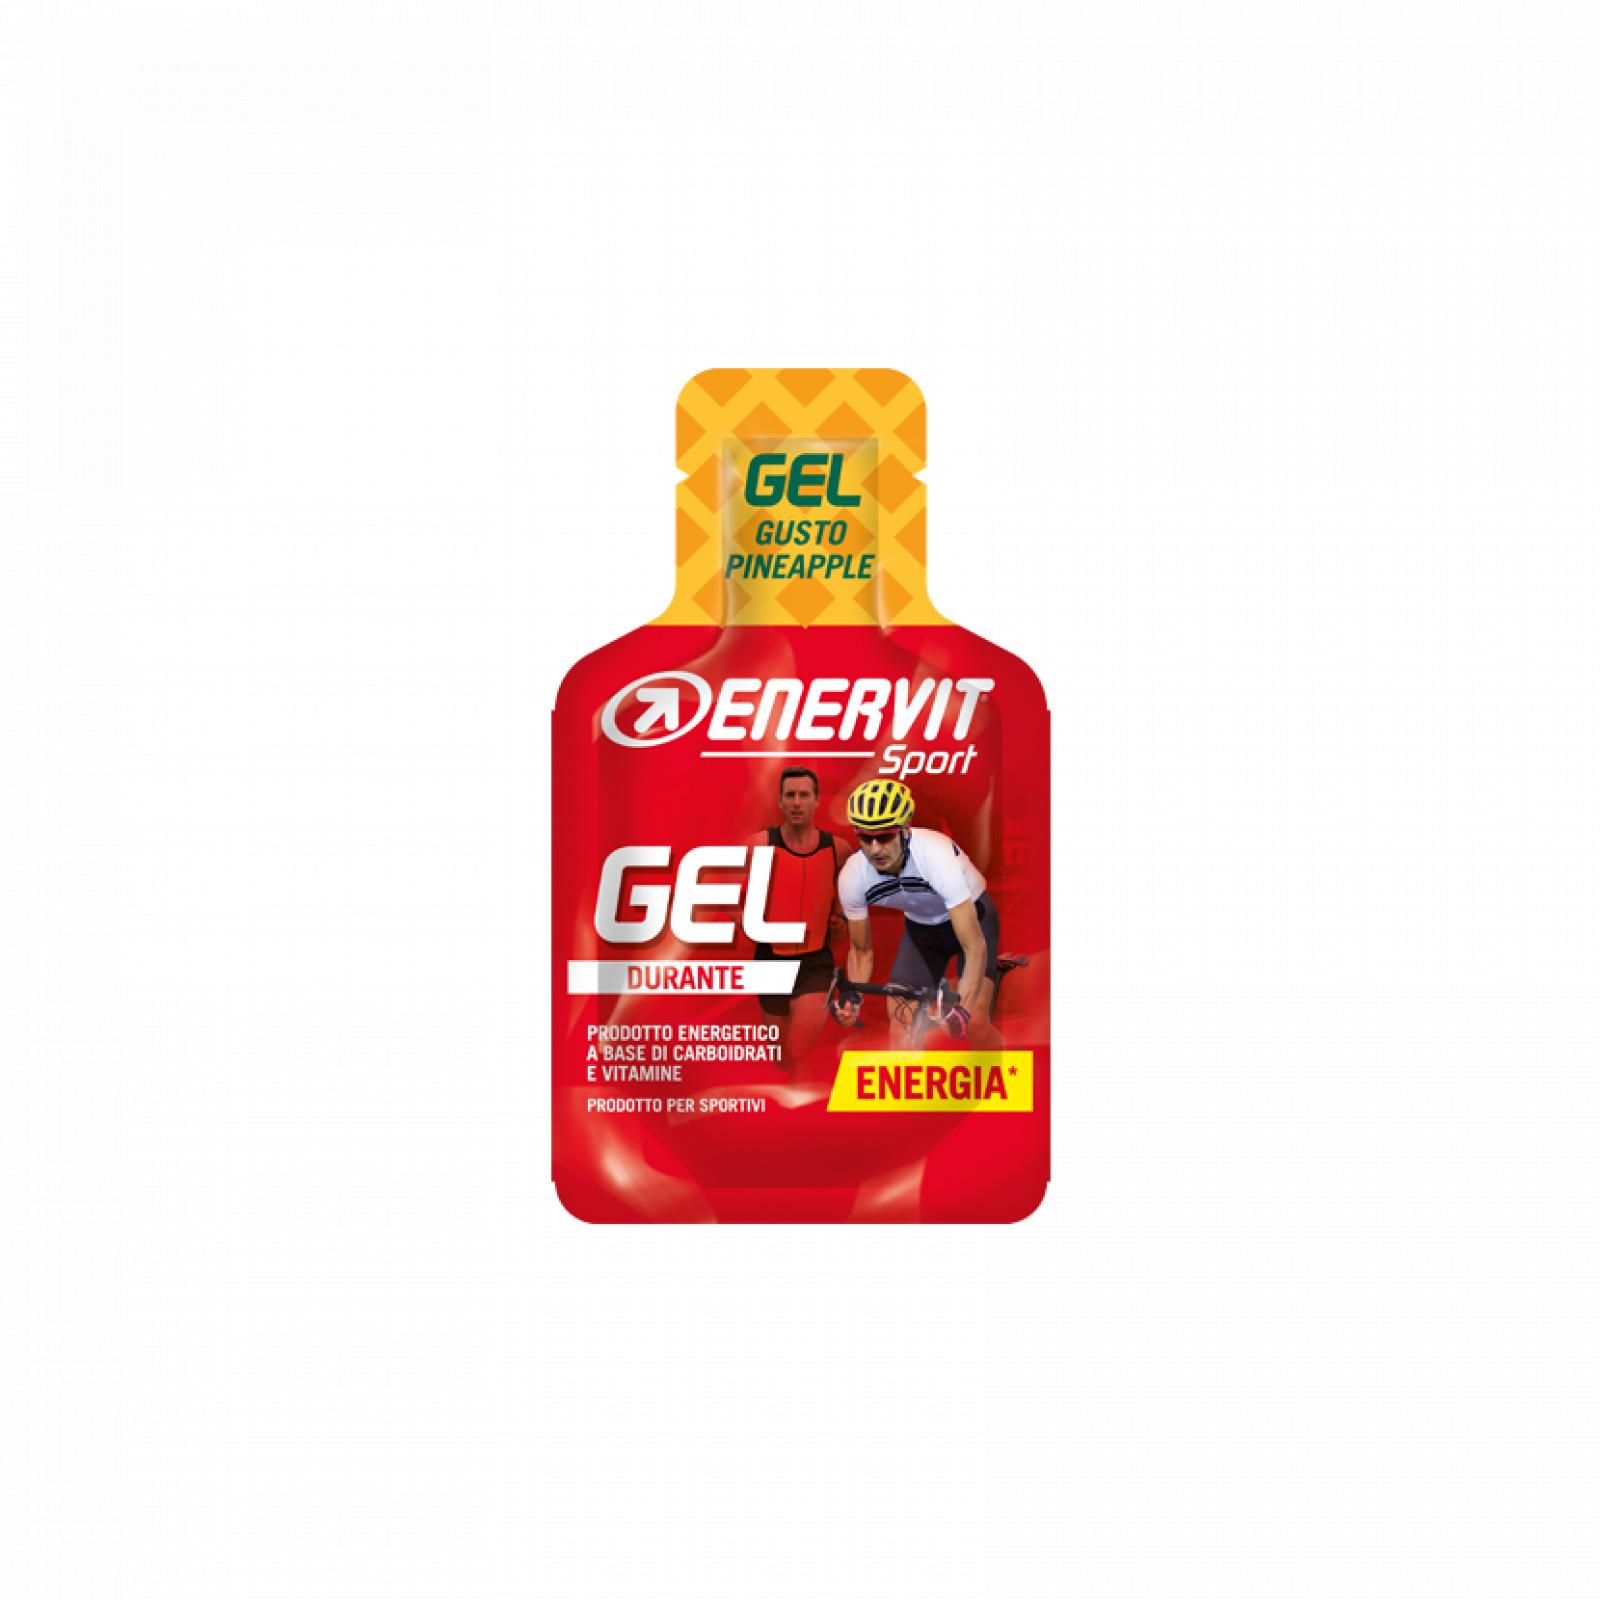 https://www.badec.store/produkty_img/enervit-gel1602782884L.png